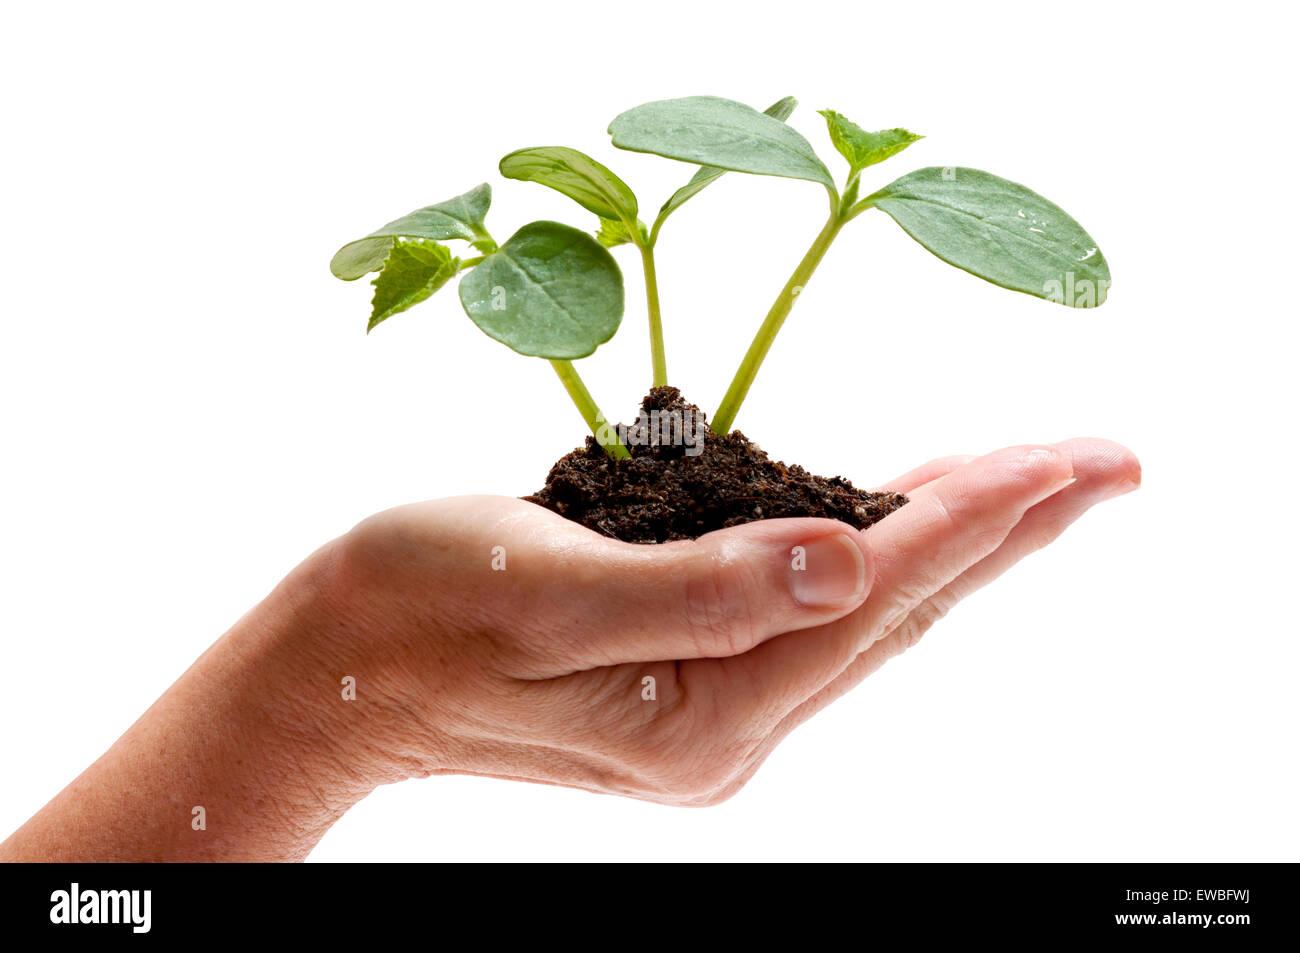 Holding New Life Symbol.  Hand holding young squash plants on white background - Stock Image